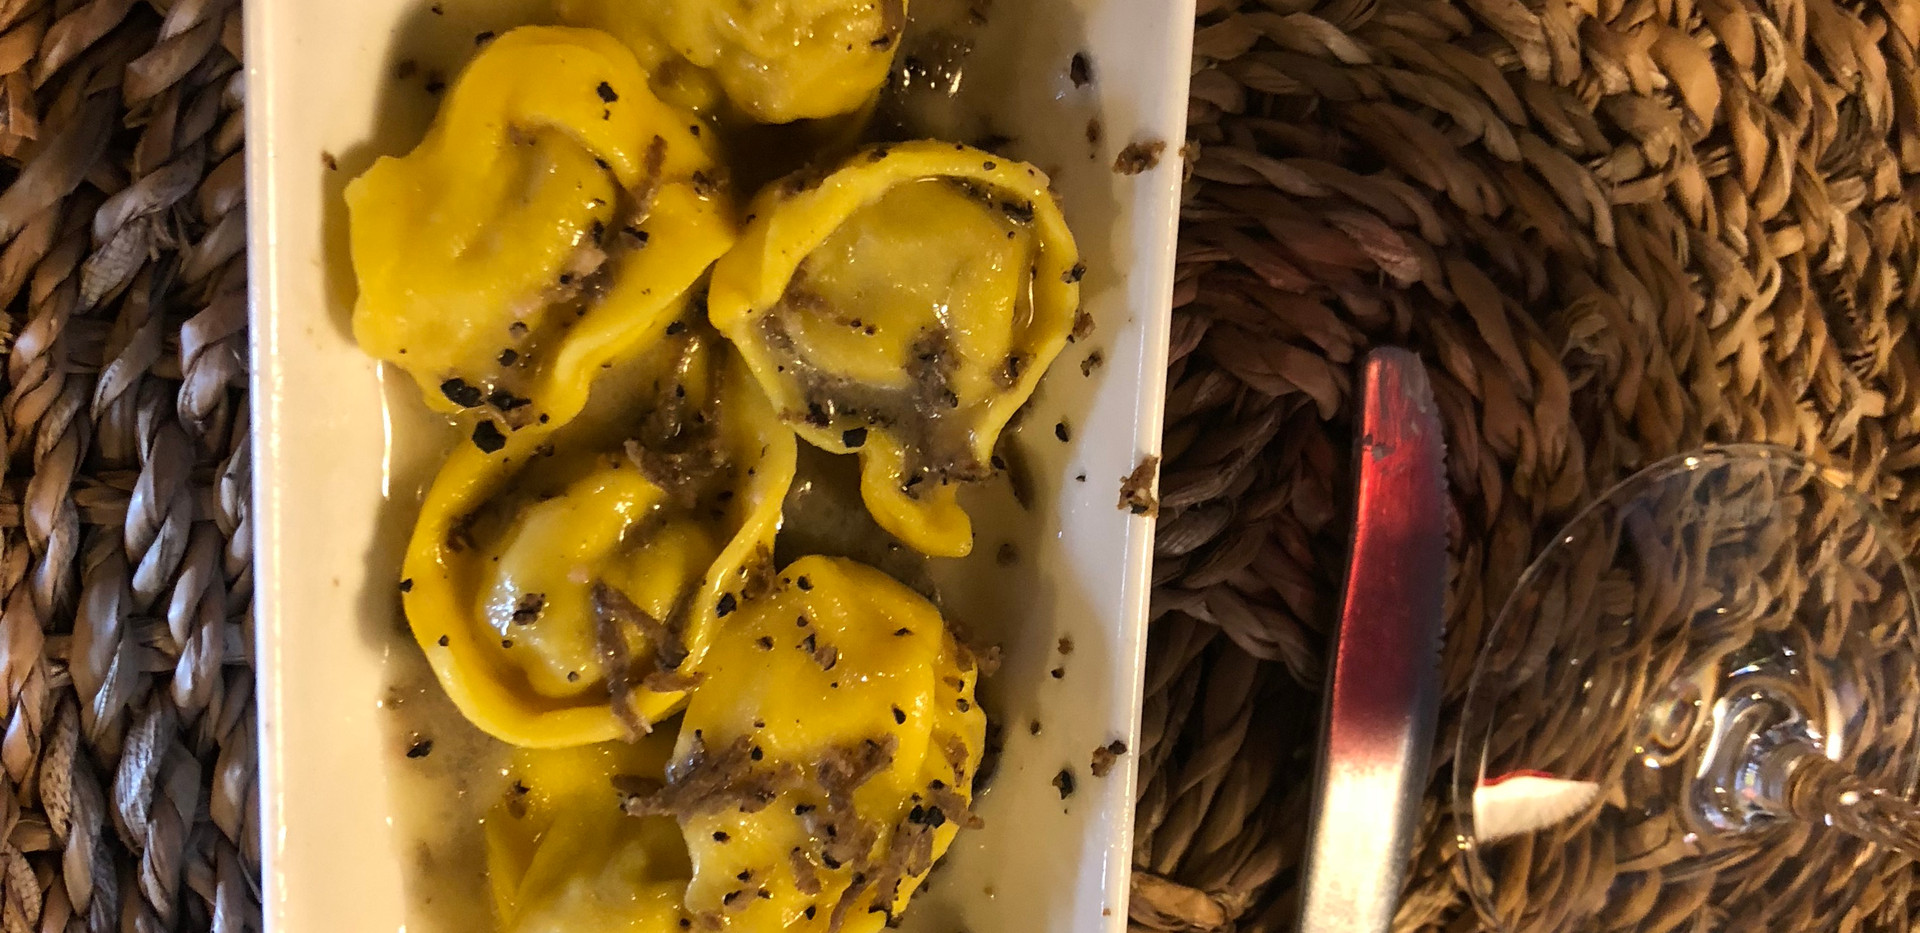 Meat stuffed Cappelletti with truffle at Ristorante Lillotatini - Panacale